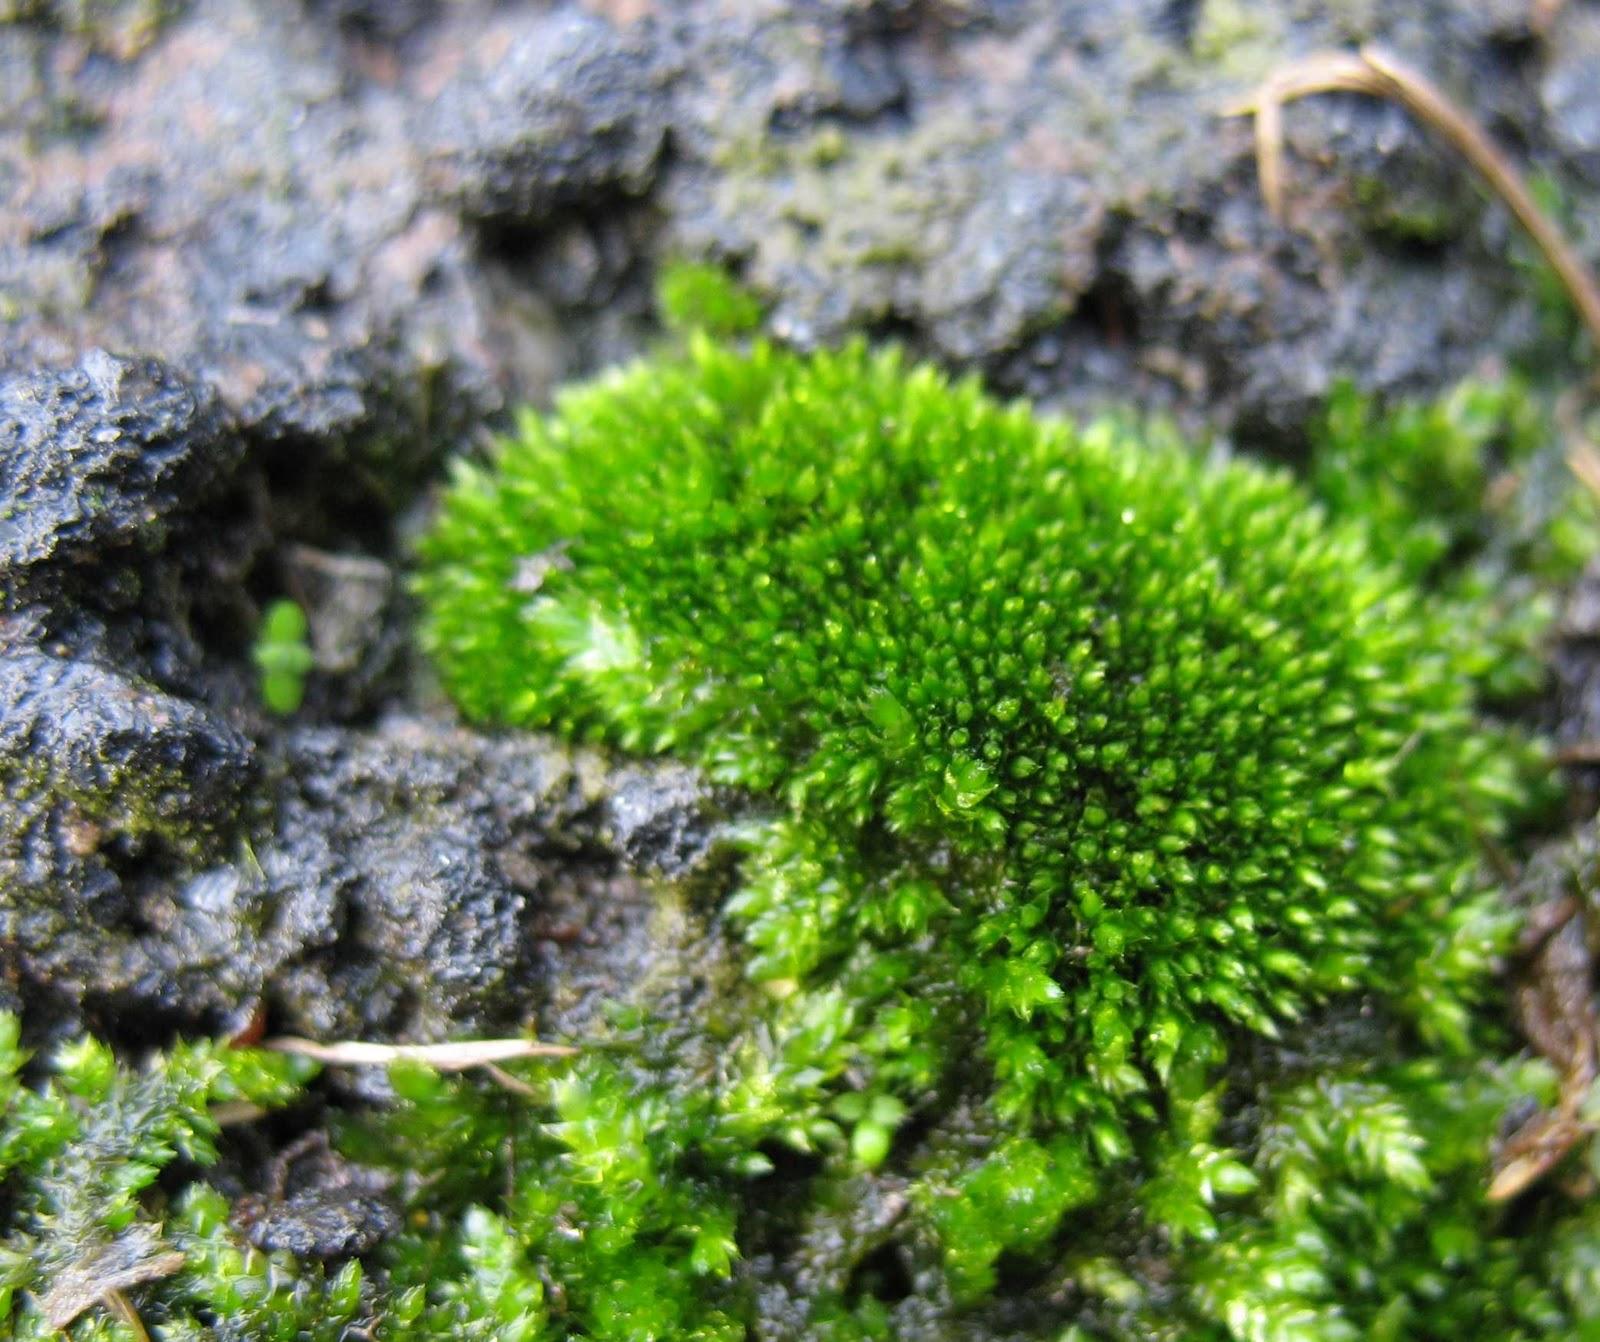 Using Georgia Native Plants: Marvelous Moss